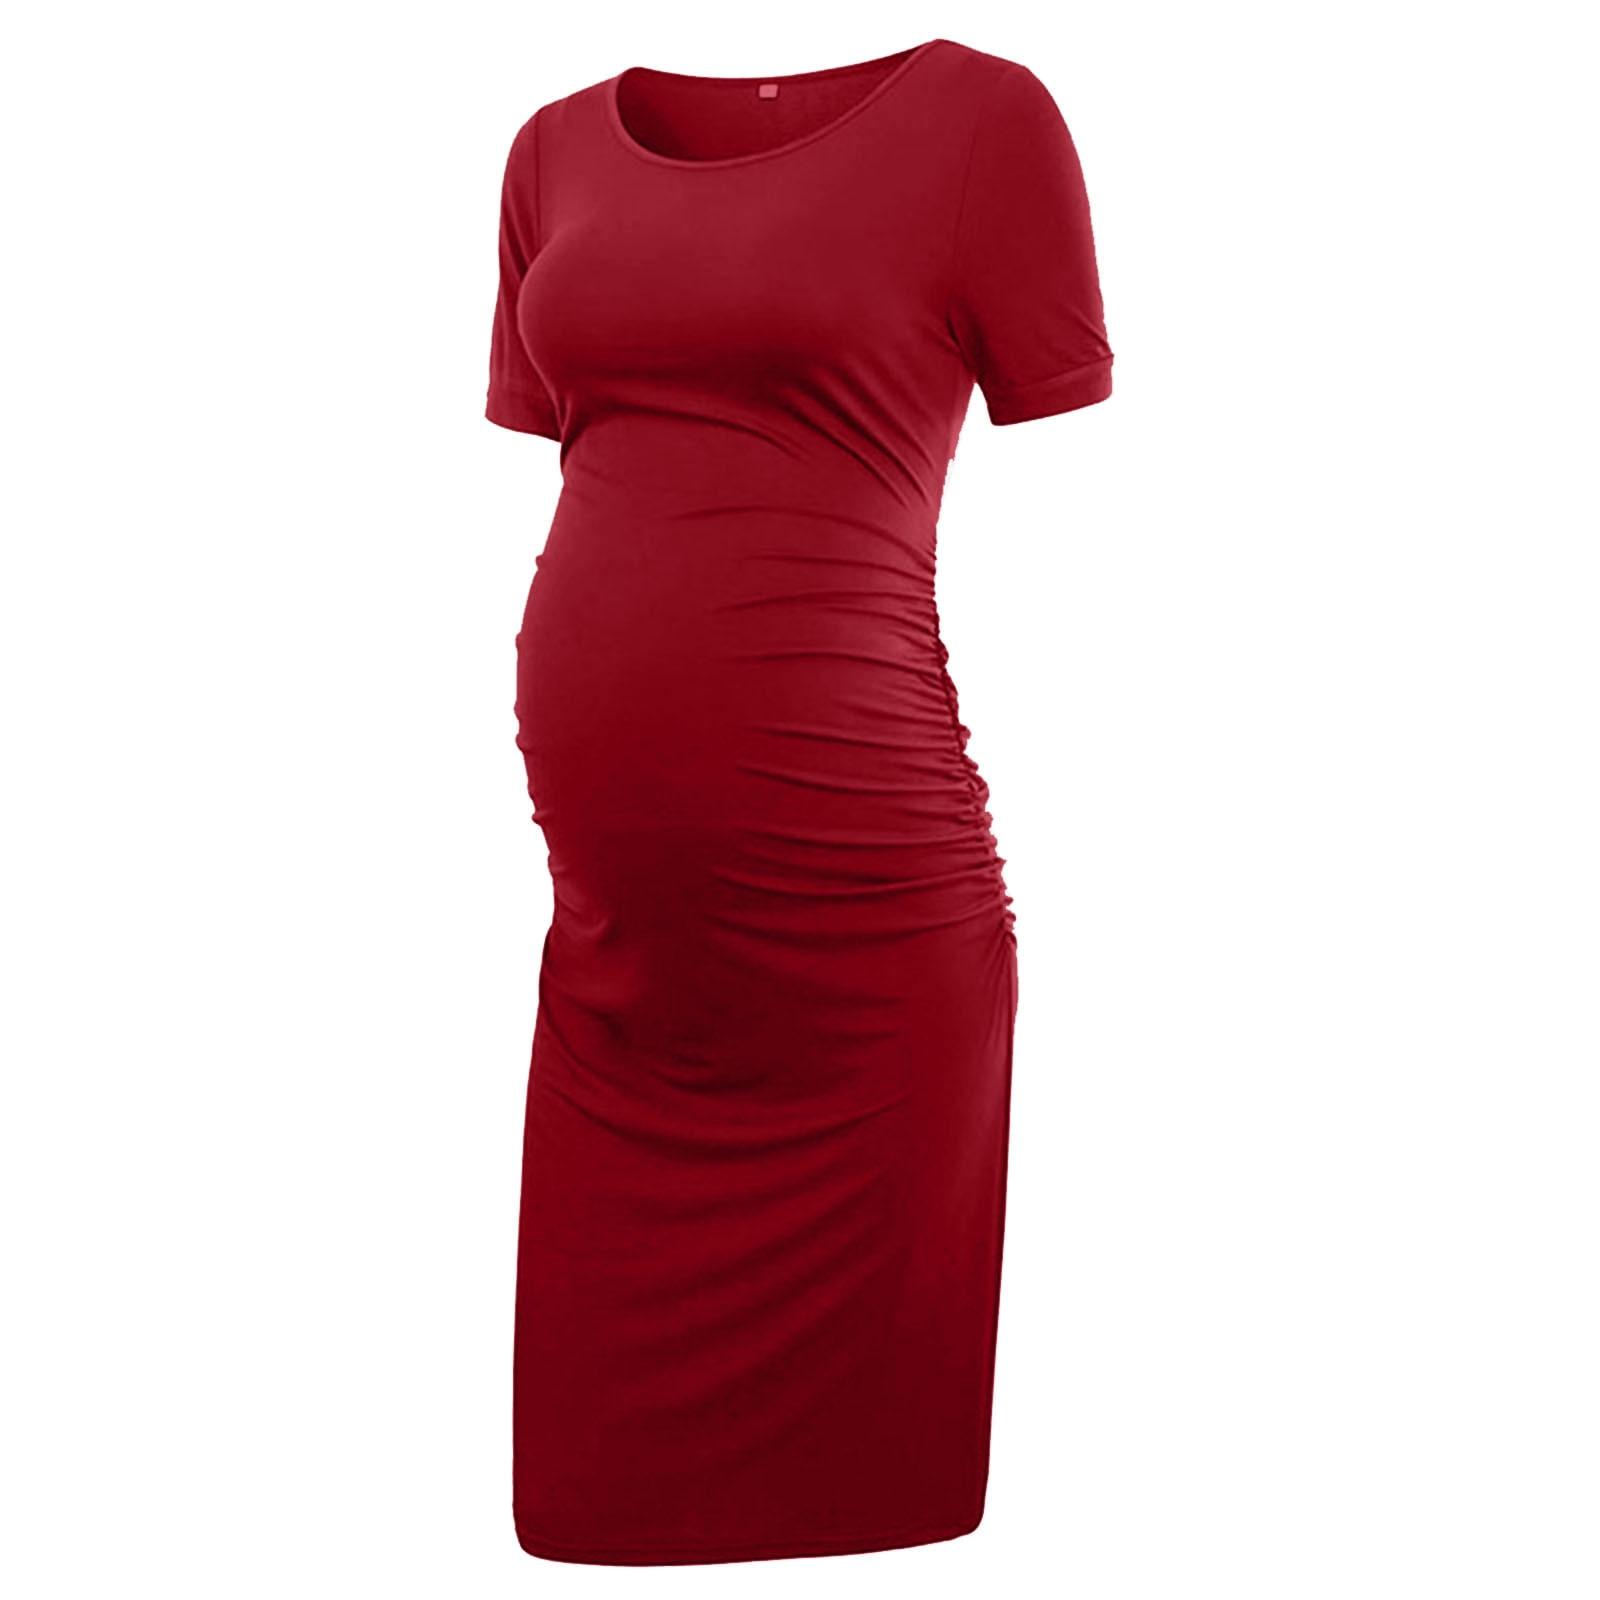 Women's Maternity Tight-Fitting Dresses